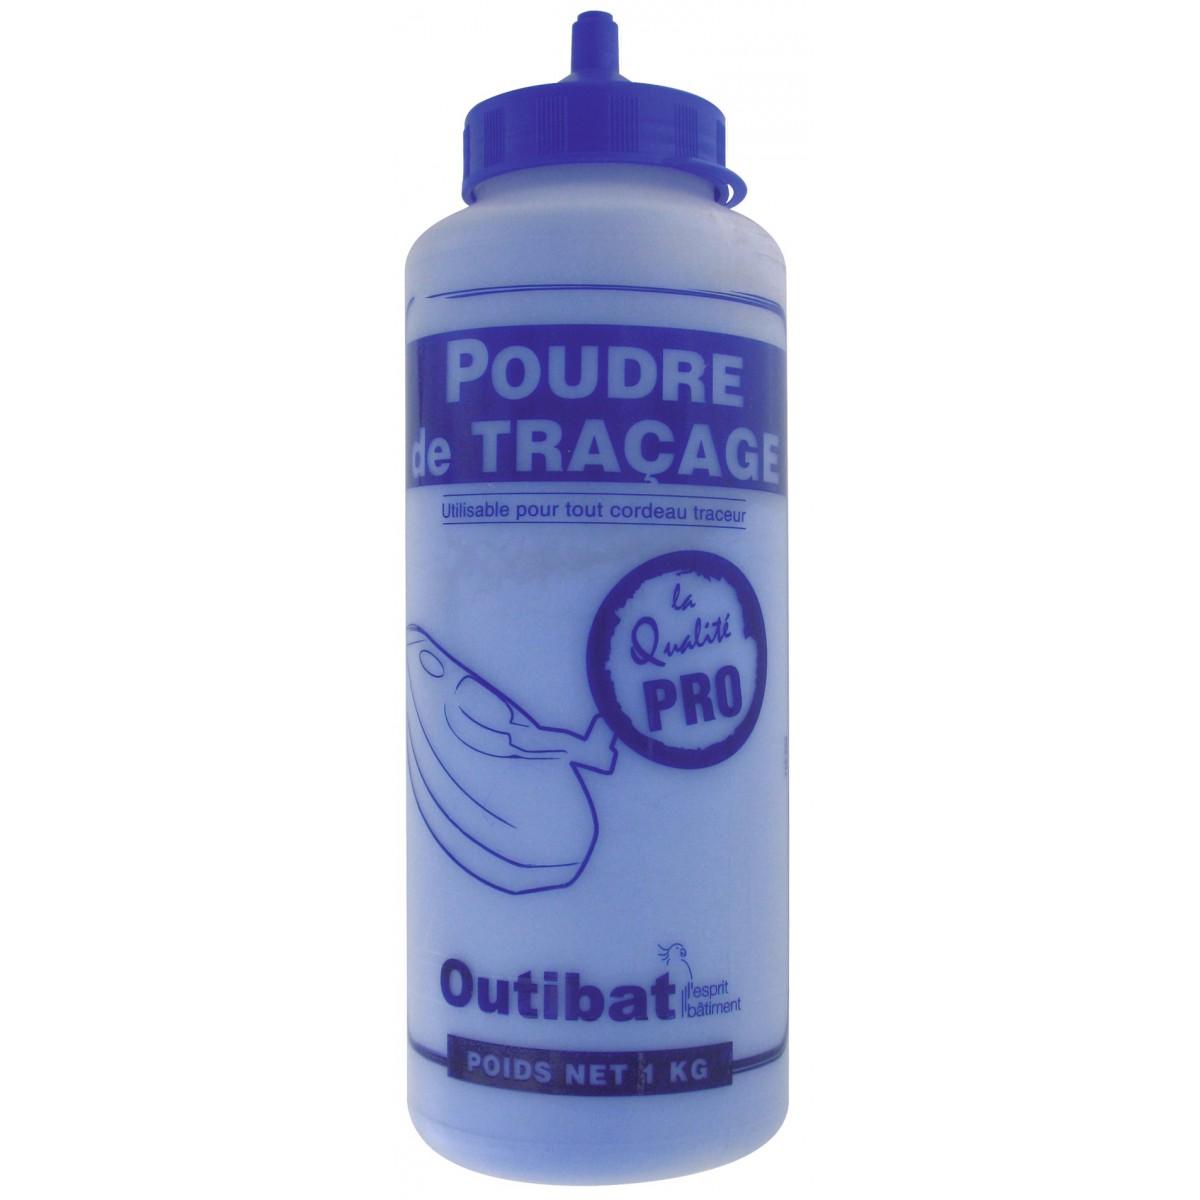 Biberon de poudre bleue Outibat - 1000 g